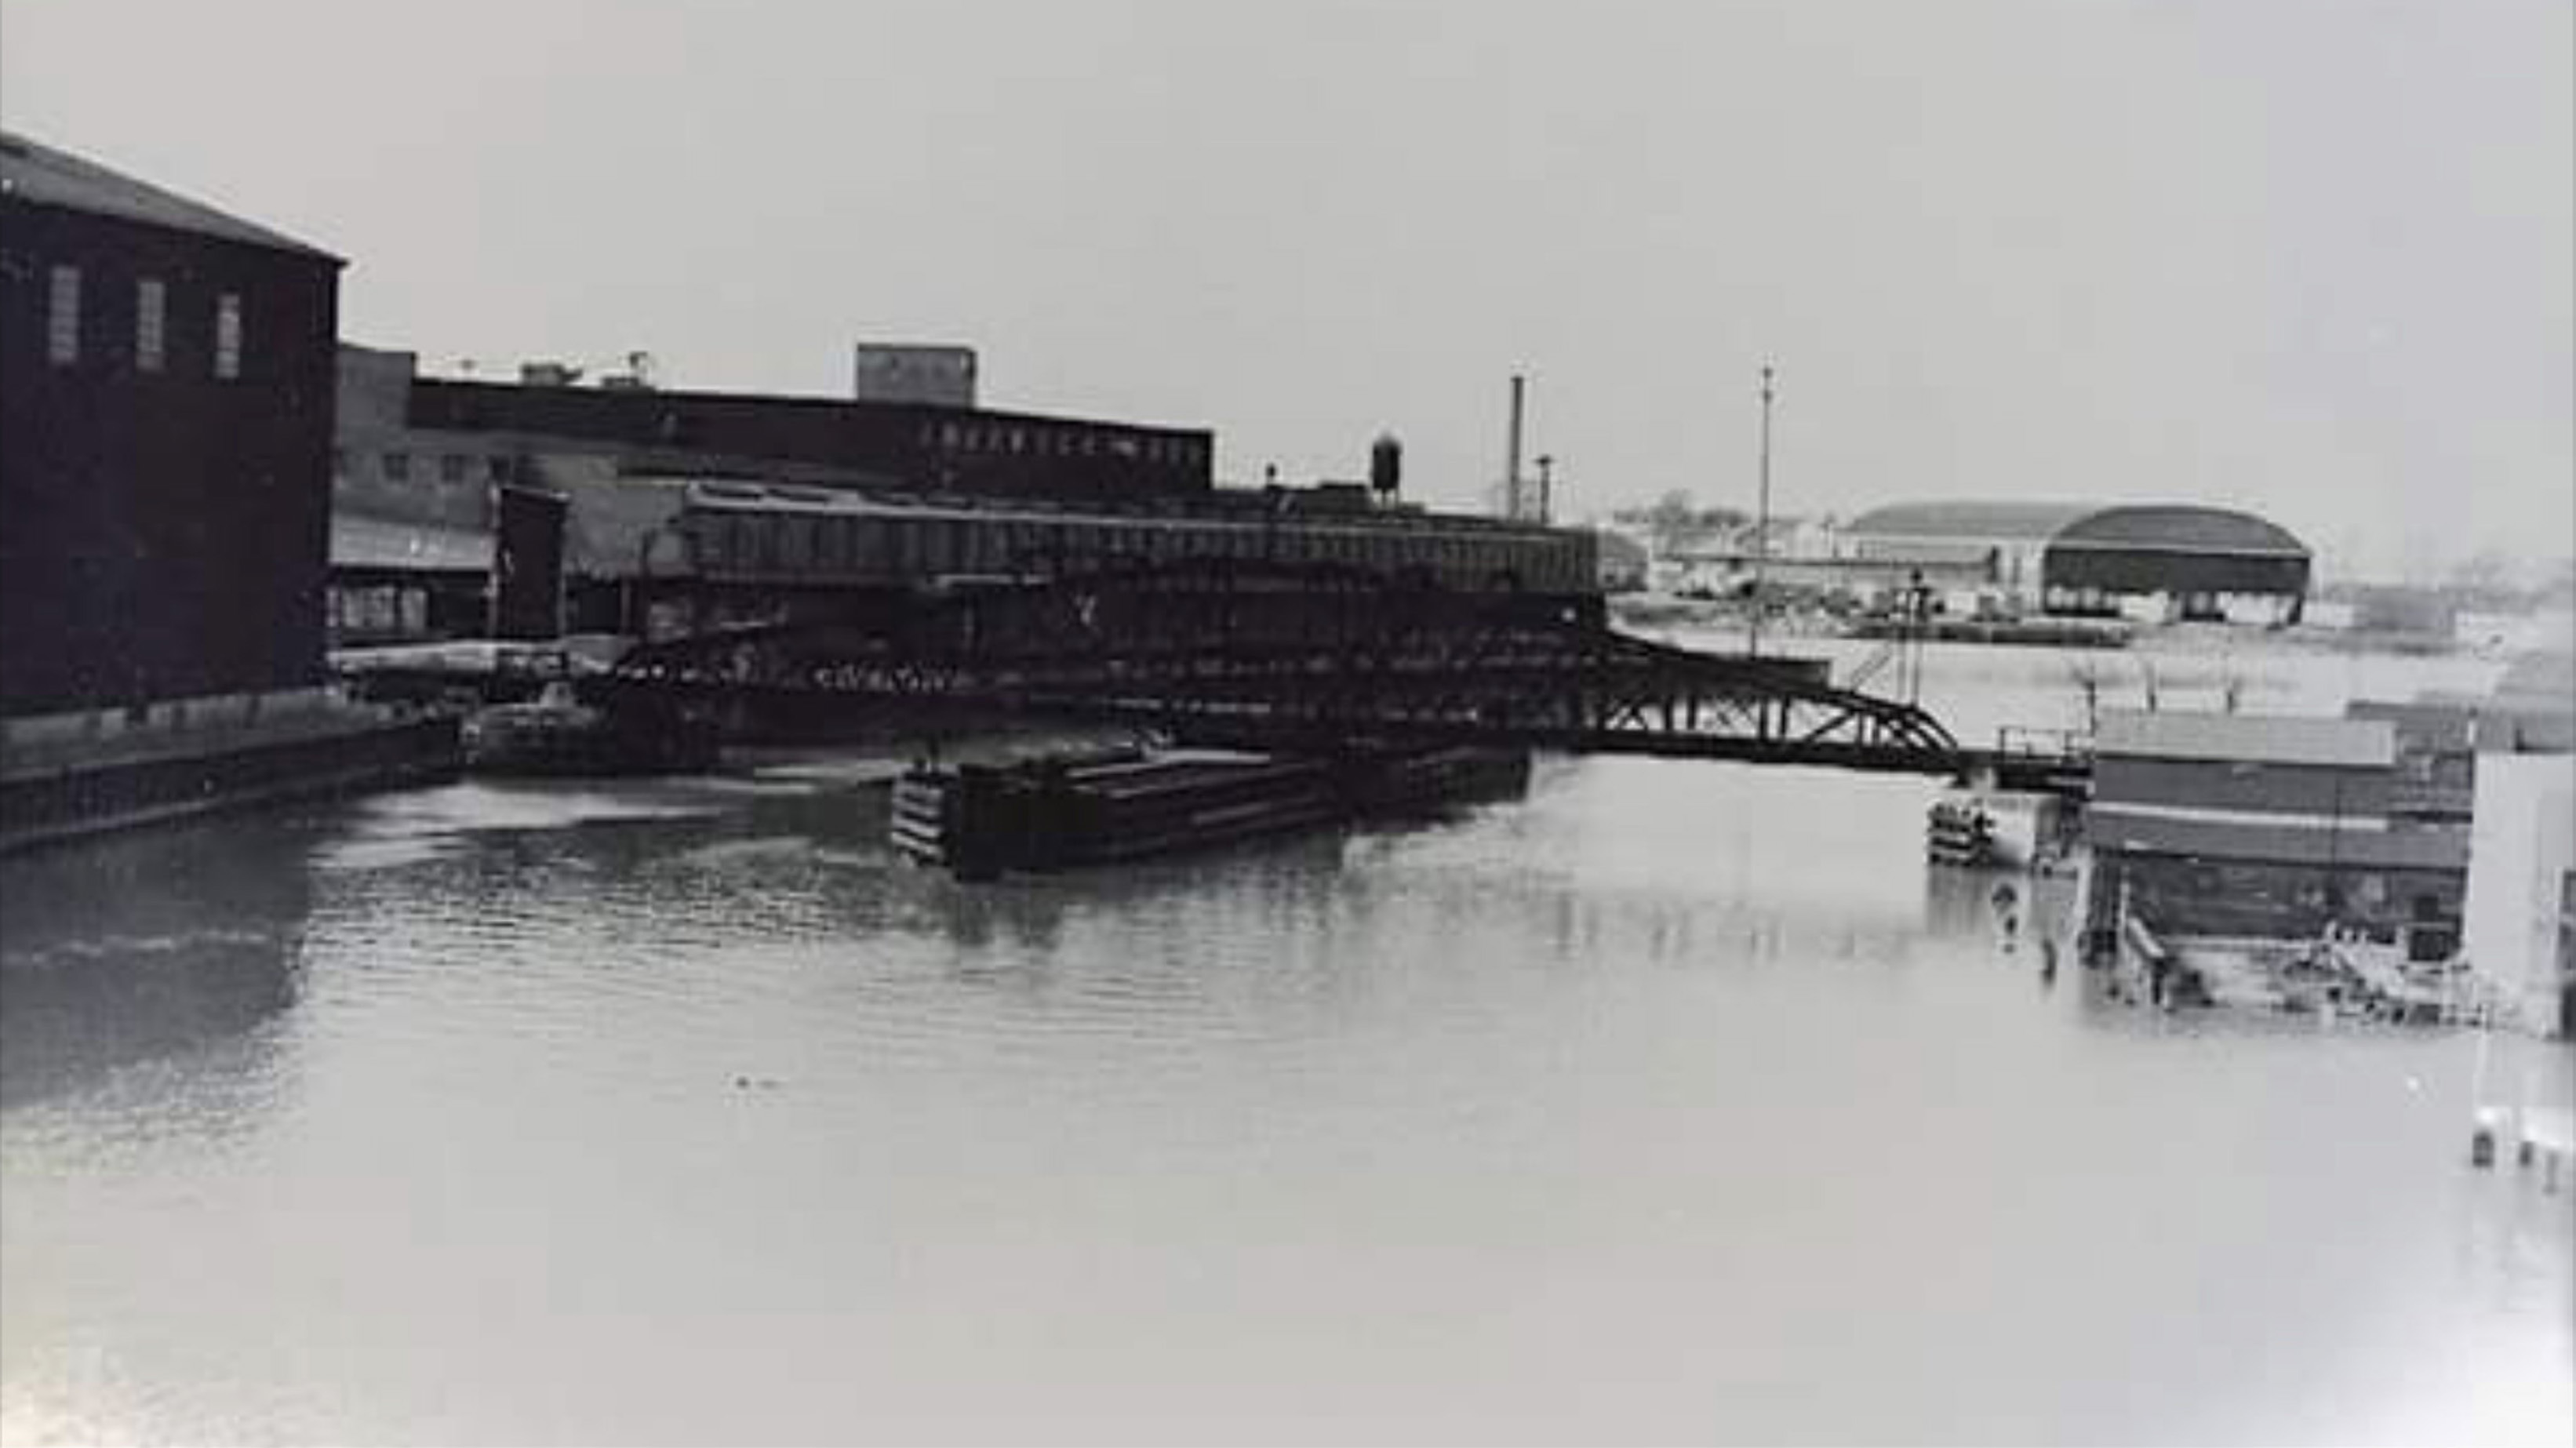 South swing bridge in operation (c1950).jpg